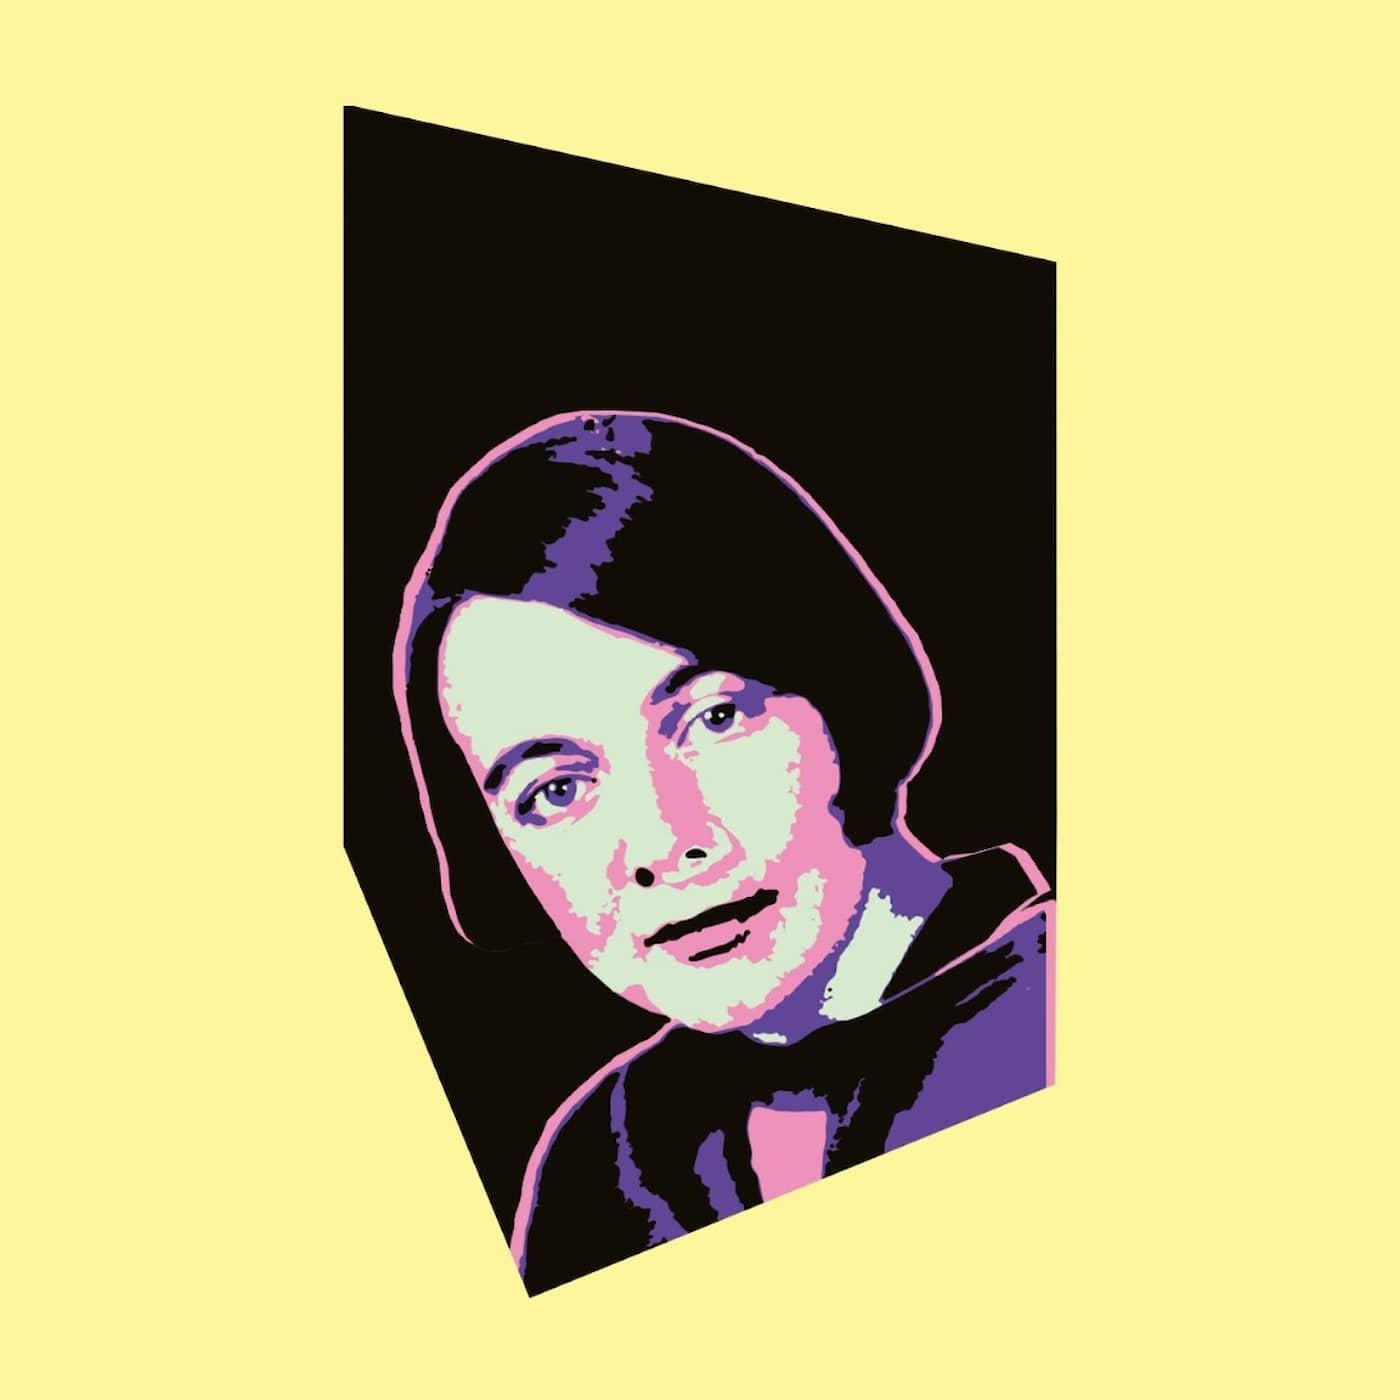 Karin Boye - dikter, damer och depression